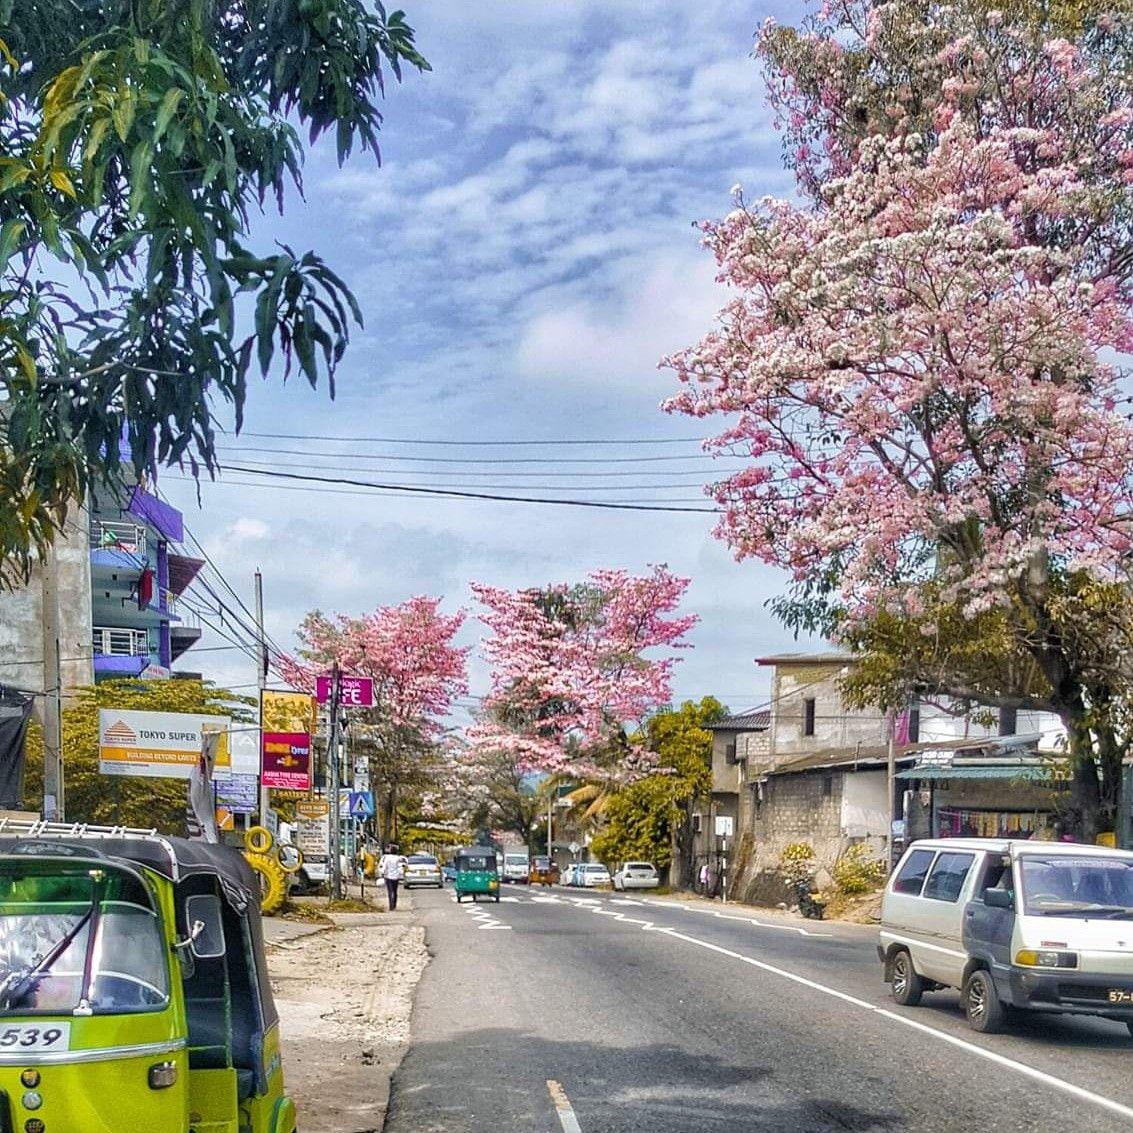 The season - Sri Lanka | Sri lanka, Street view, Scenes